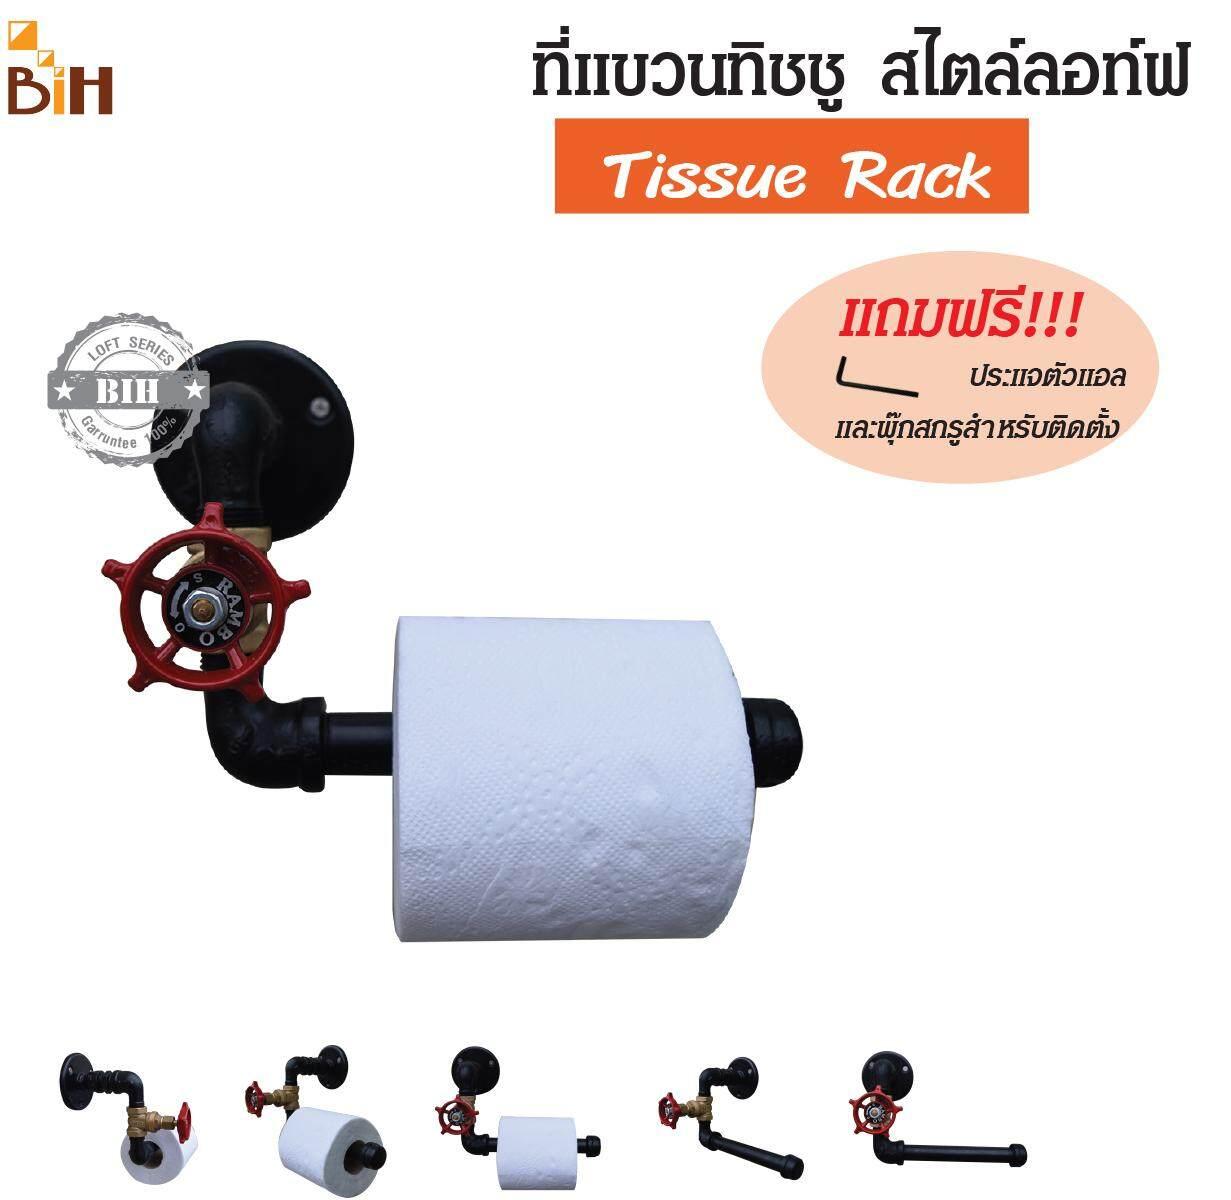 Lotf By Bih ที่แขวนกระดาษชำระ Tissue Rack By Bih.